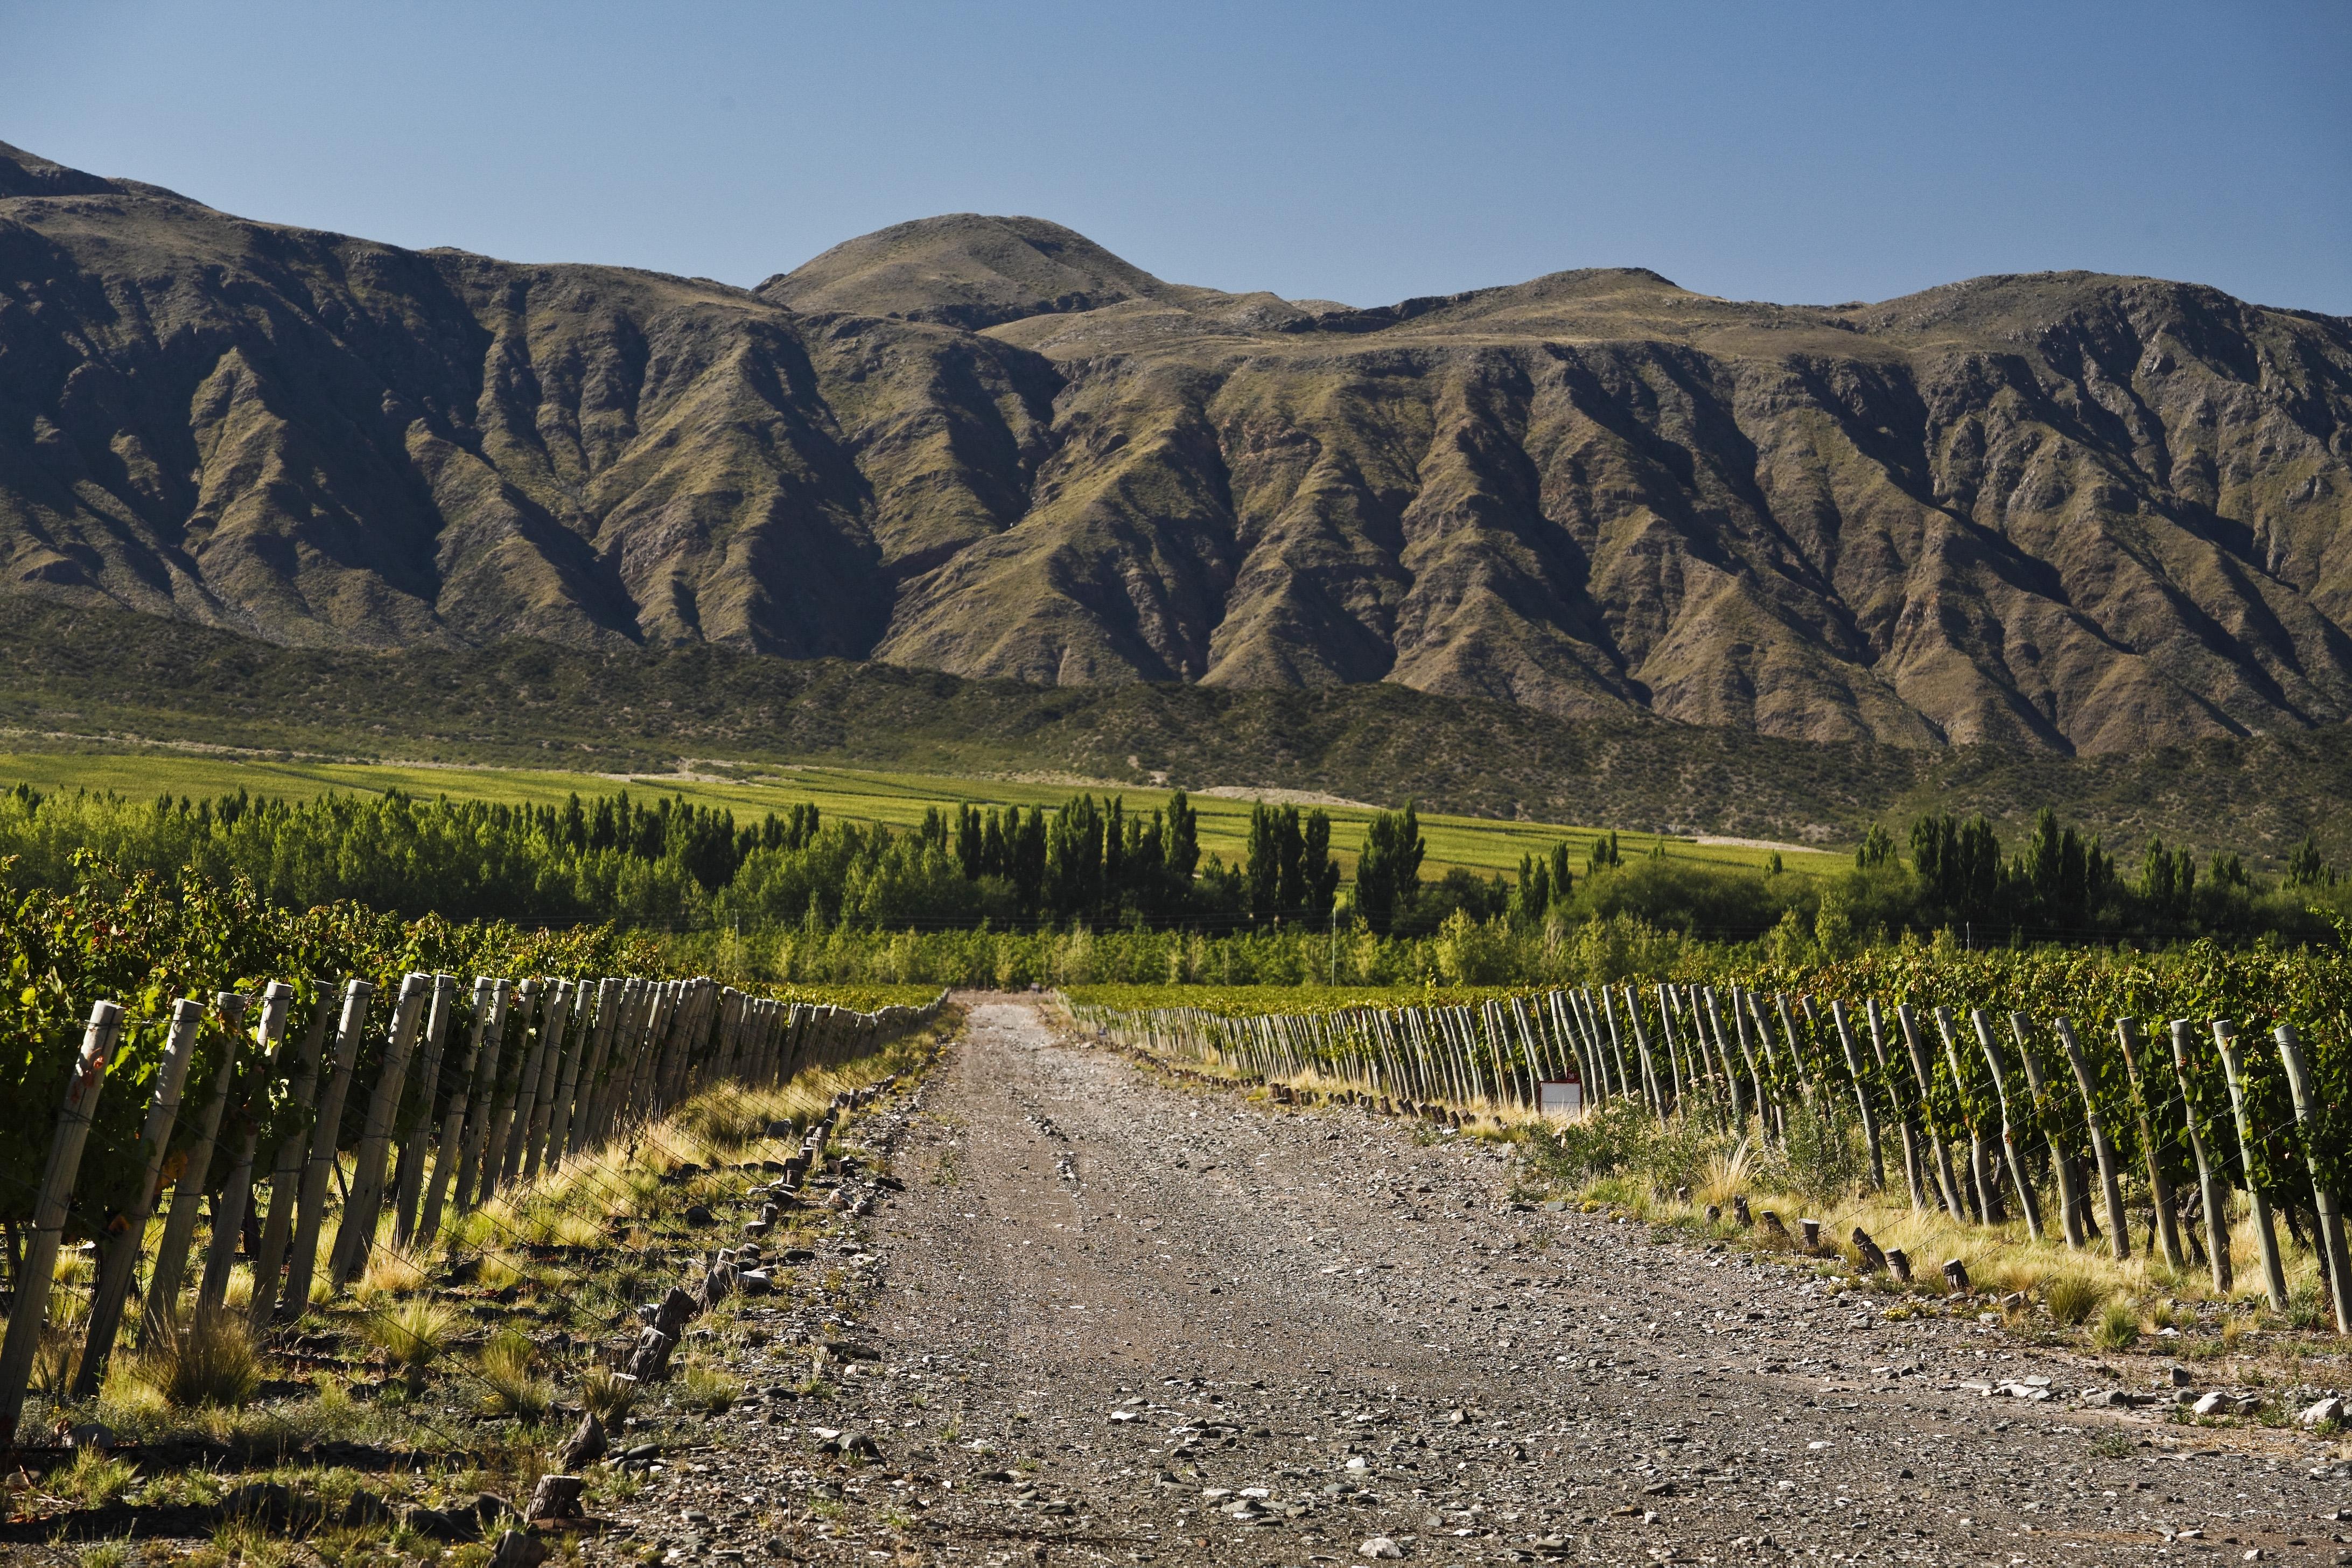 Wines of Argentina - Viva o Vinho